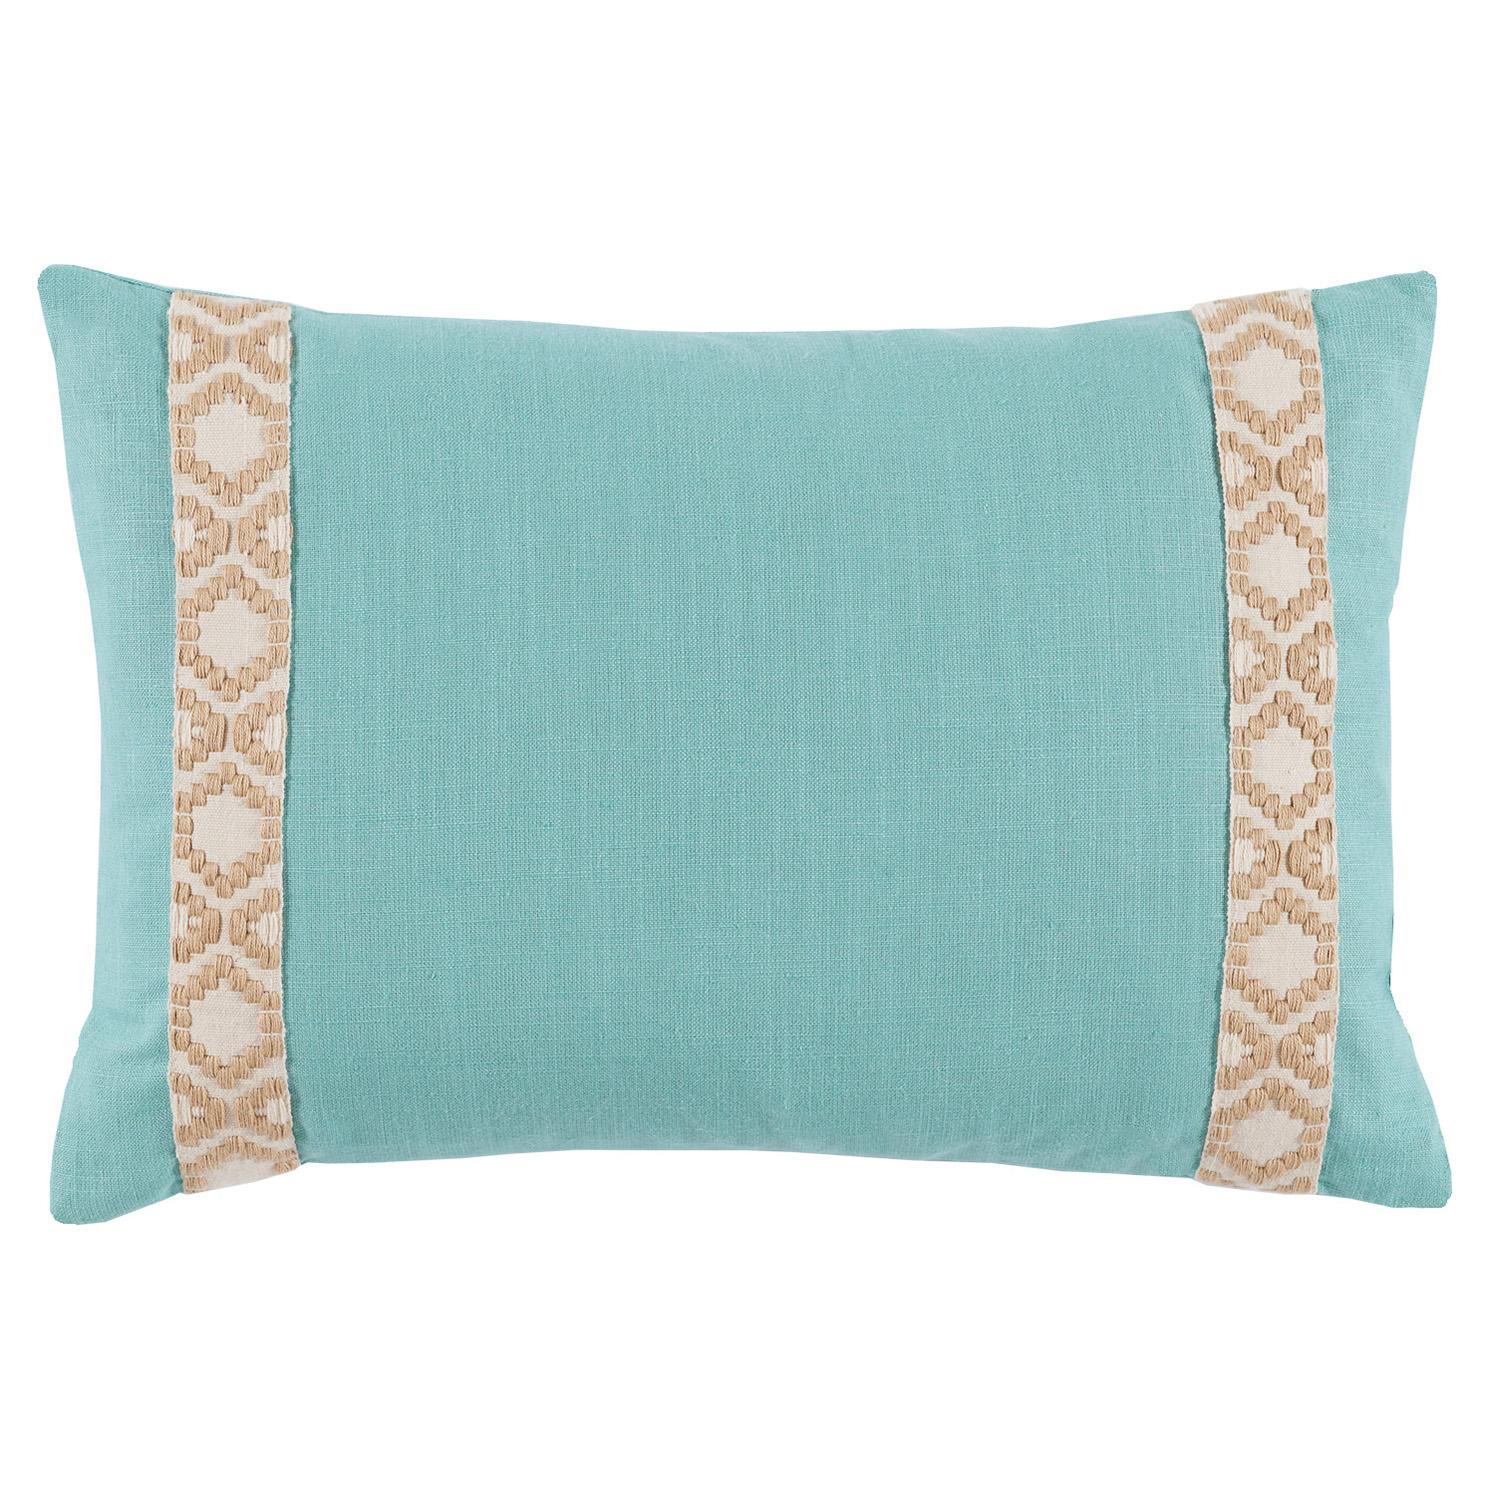 Kaia Global Aqua Linen Trim Band Pillow - 13x19